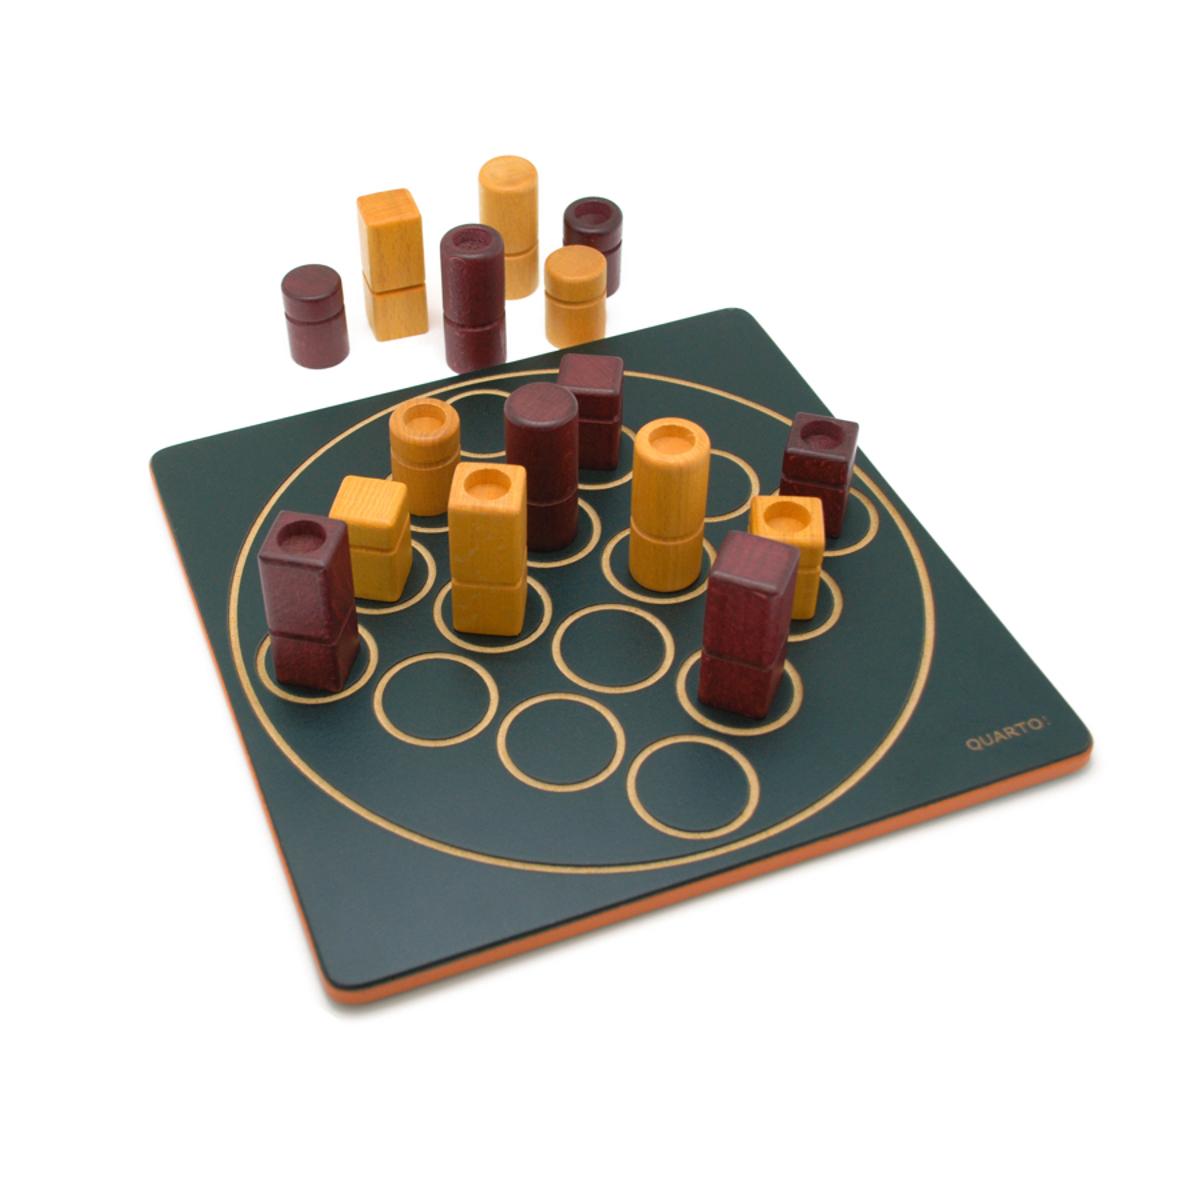 GIGAMIC|世界最多の賞に輝くボードゲームの王様 QUARTO!(クアルト!)